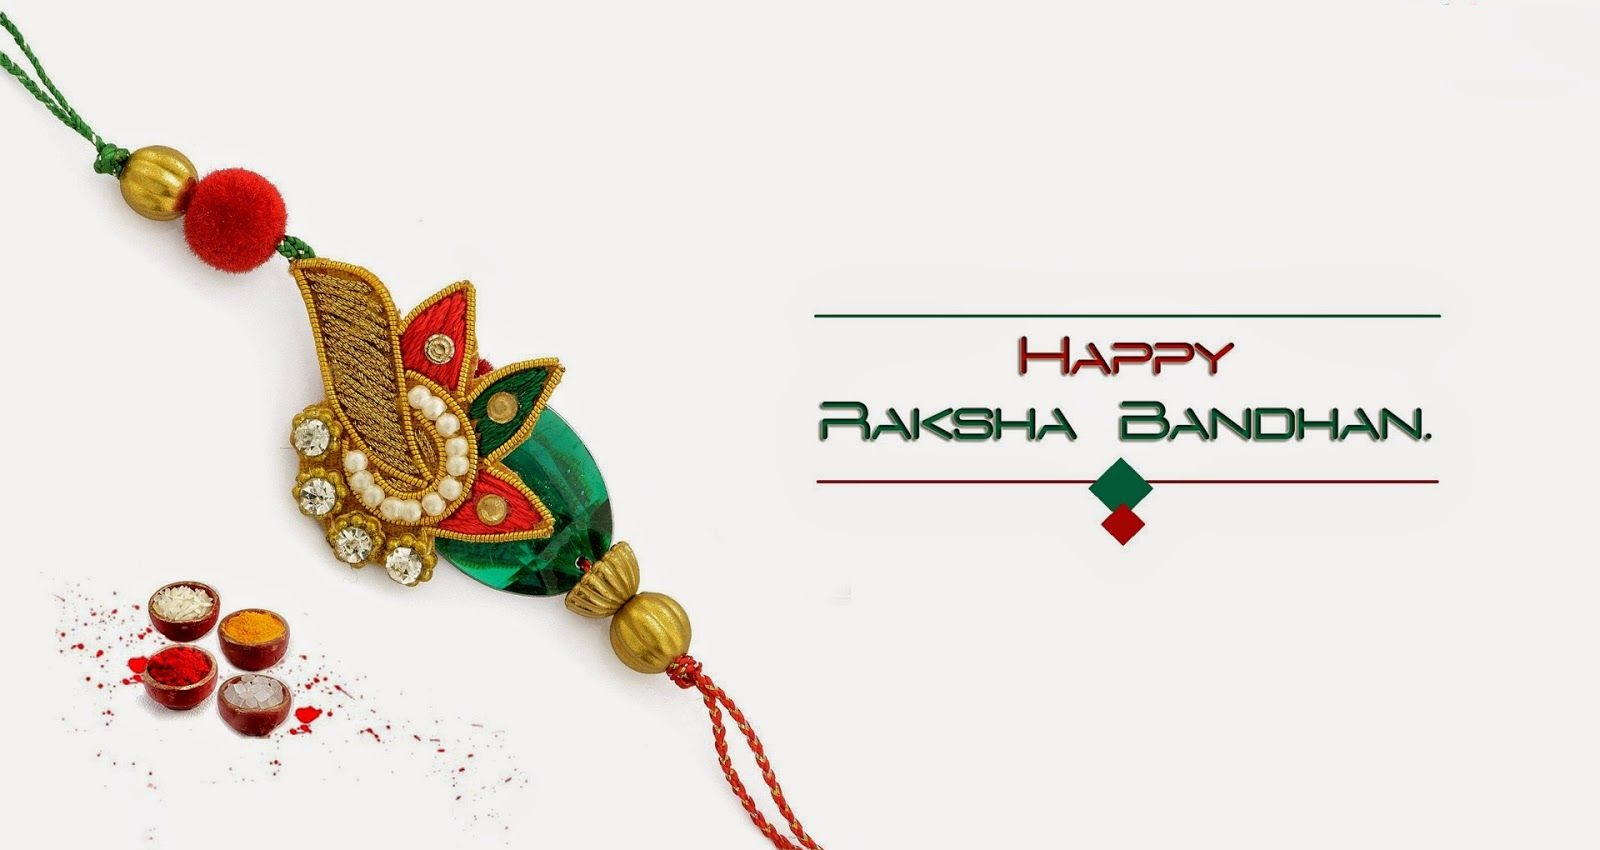 Raksha Bandhan HD Images, Wallpapers1